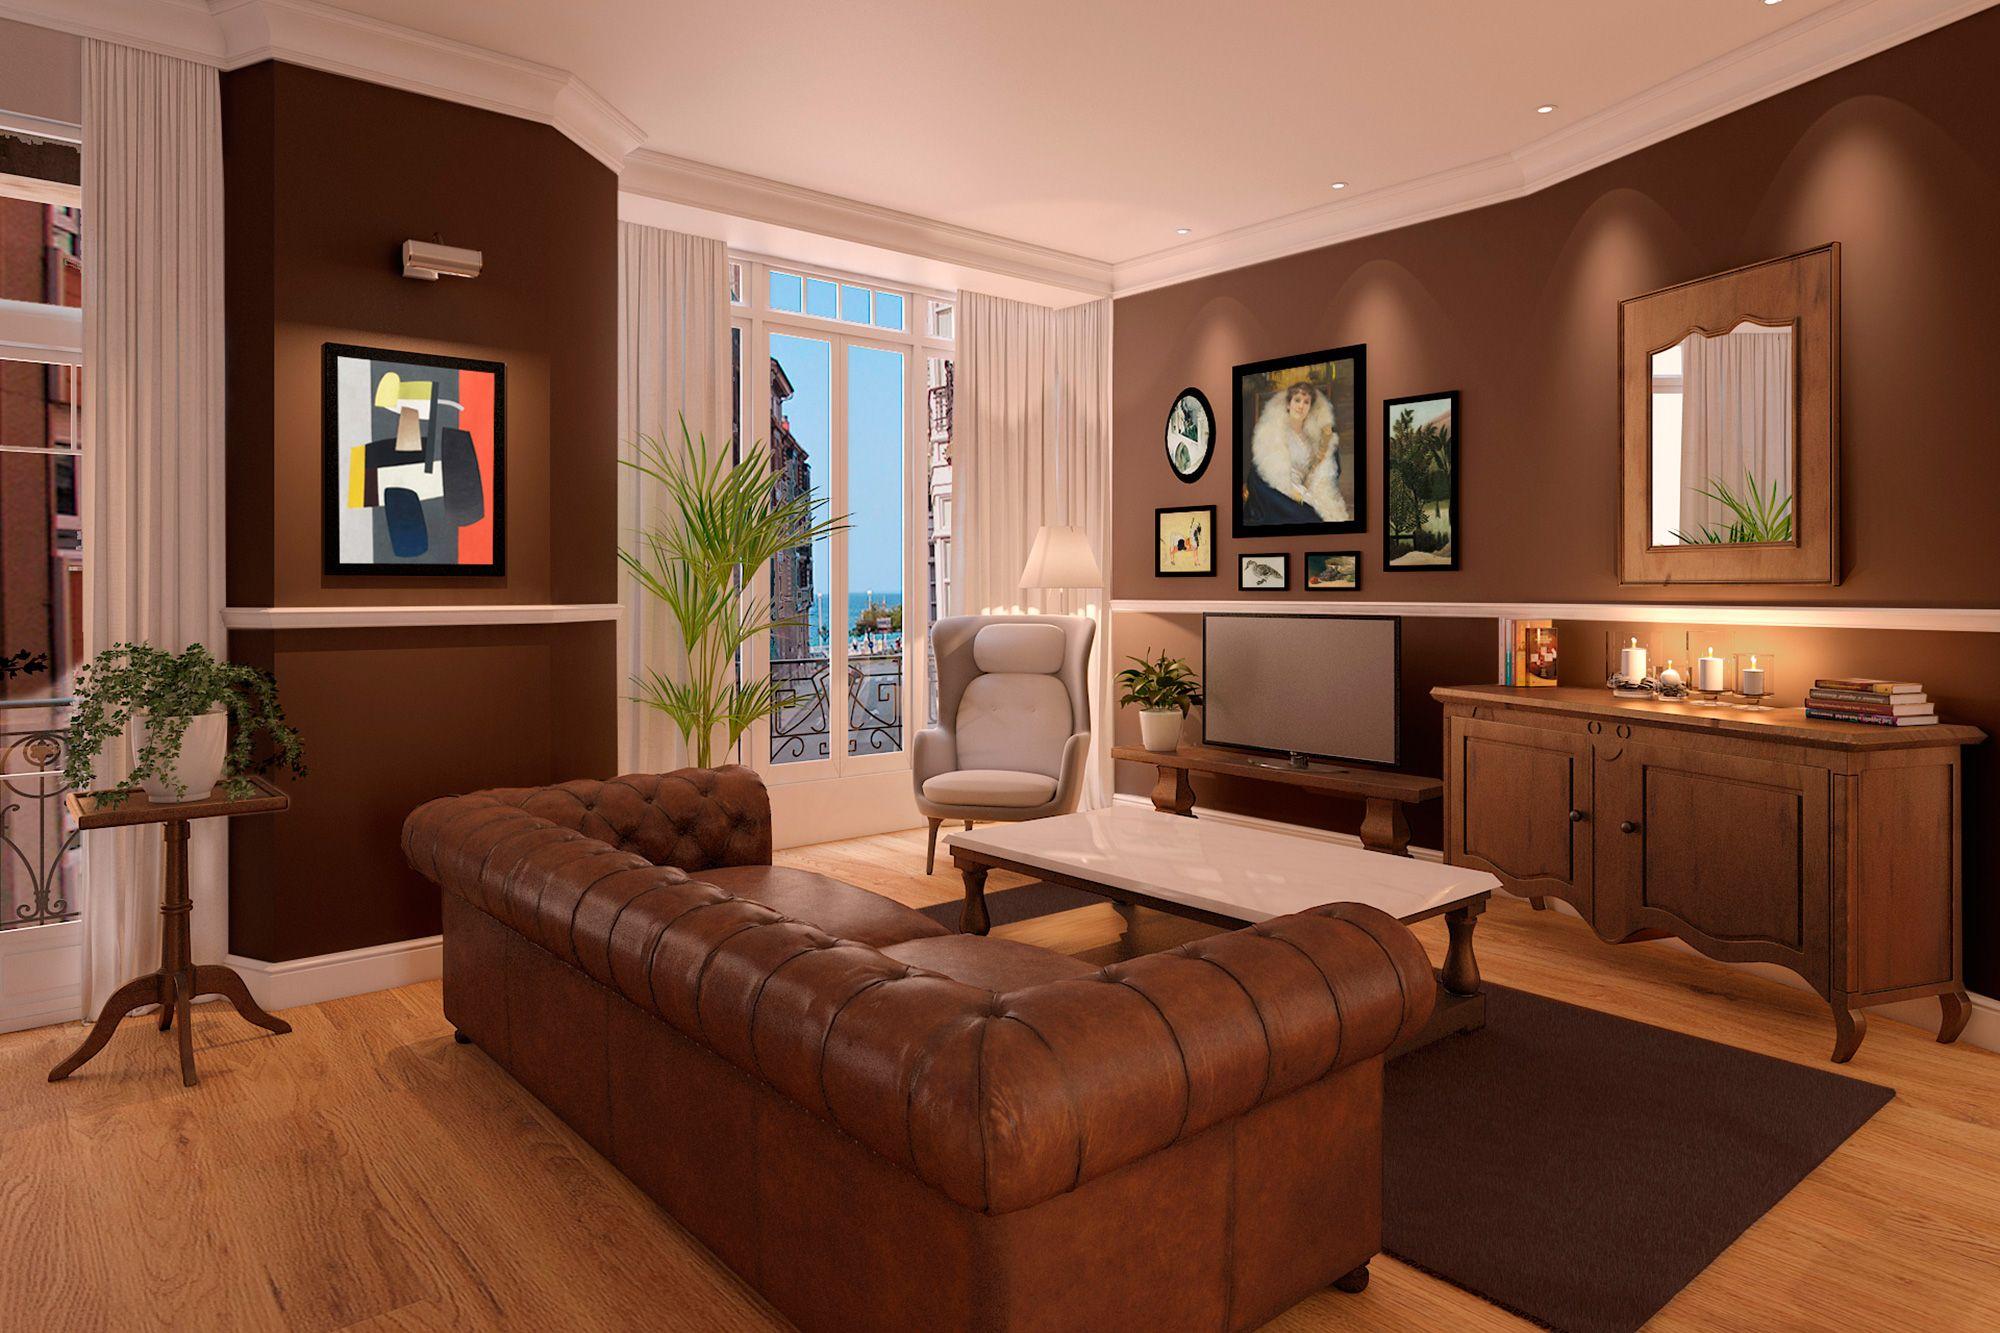 Interior design project for Goya Intercontinental. Parisian living room.  #interiordesign #parisian